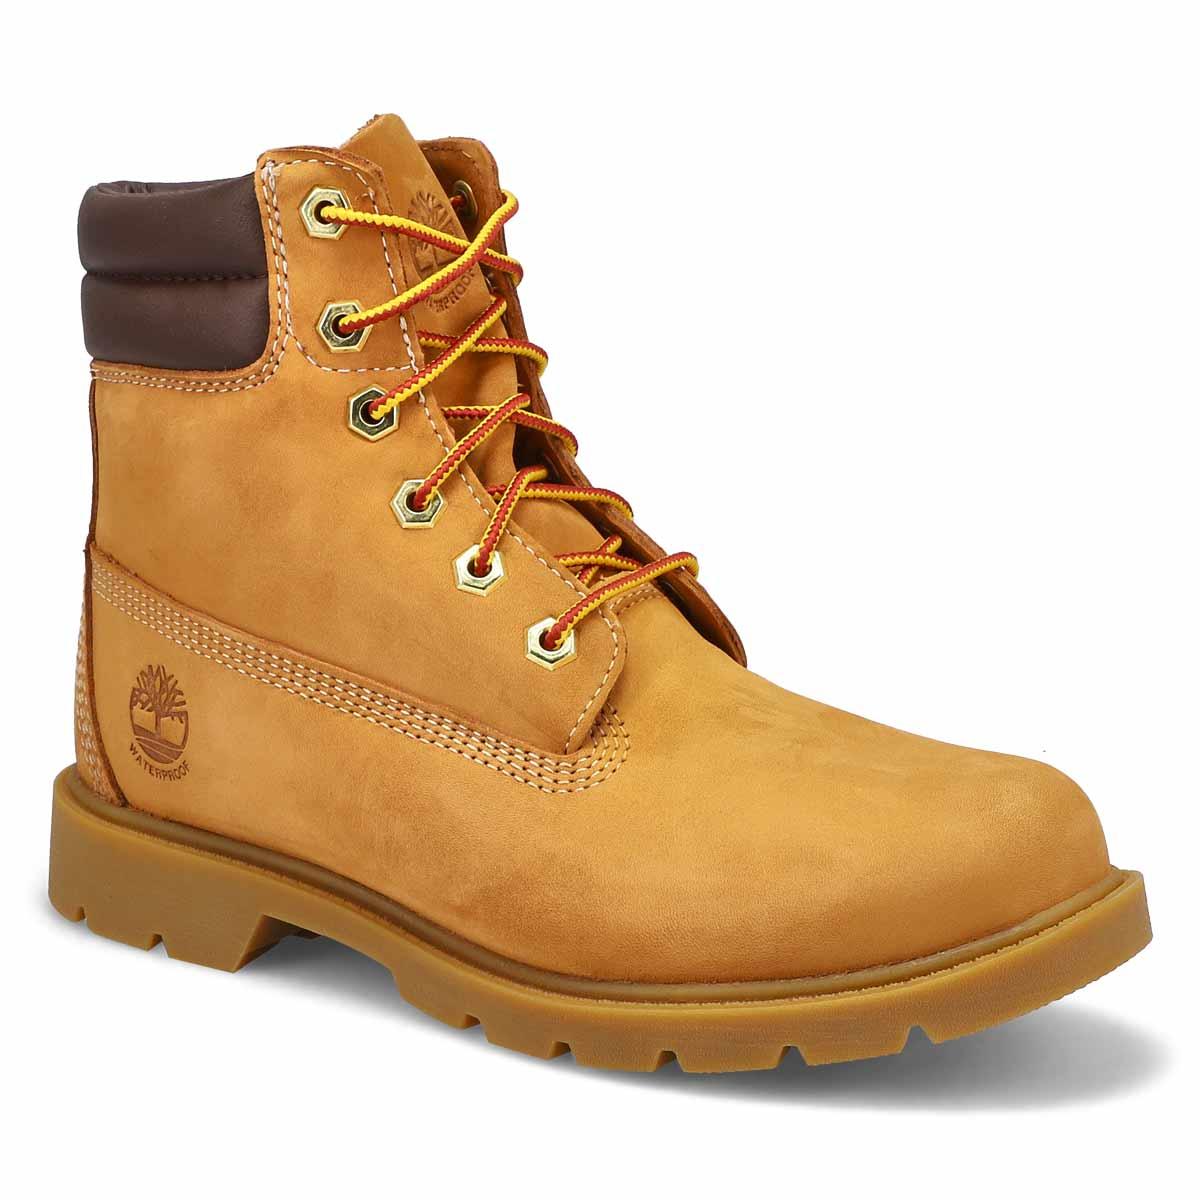 2fbcd6a368b Women's LINDEN WOODS 6 wheat waterproof boots